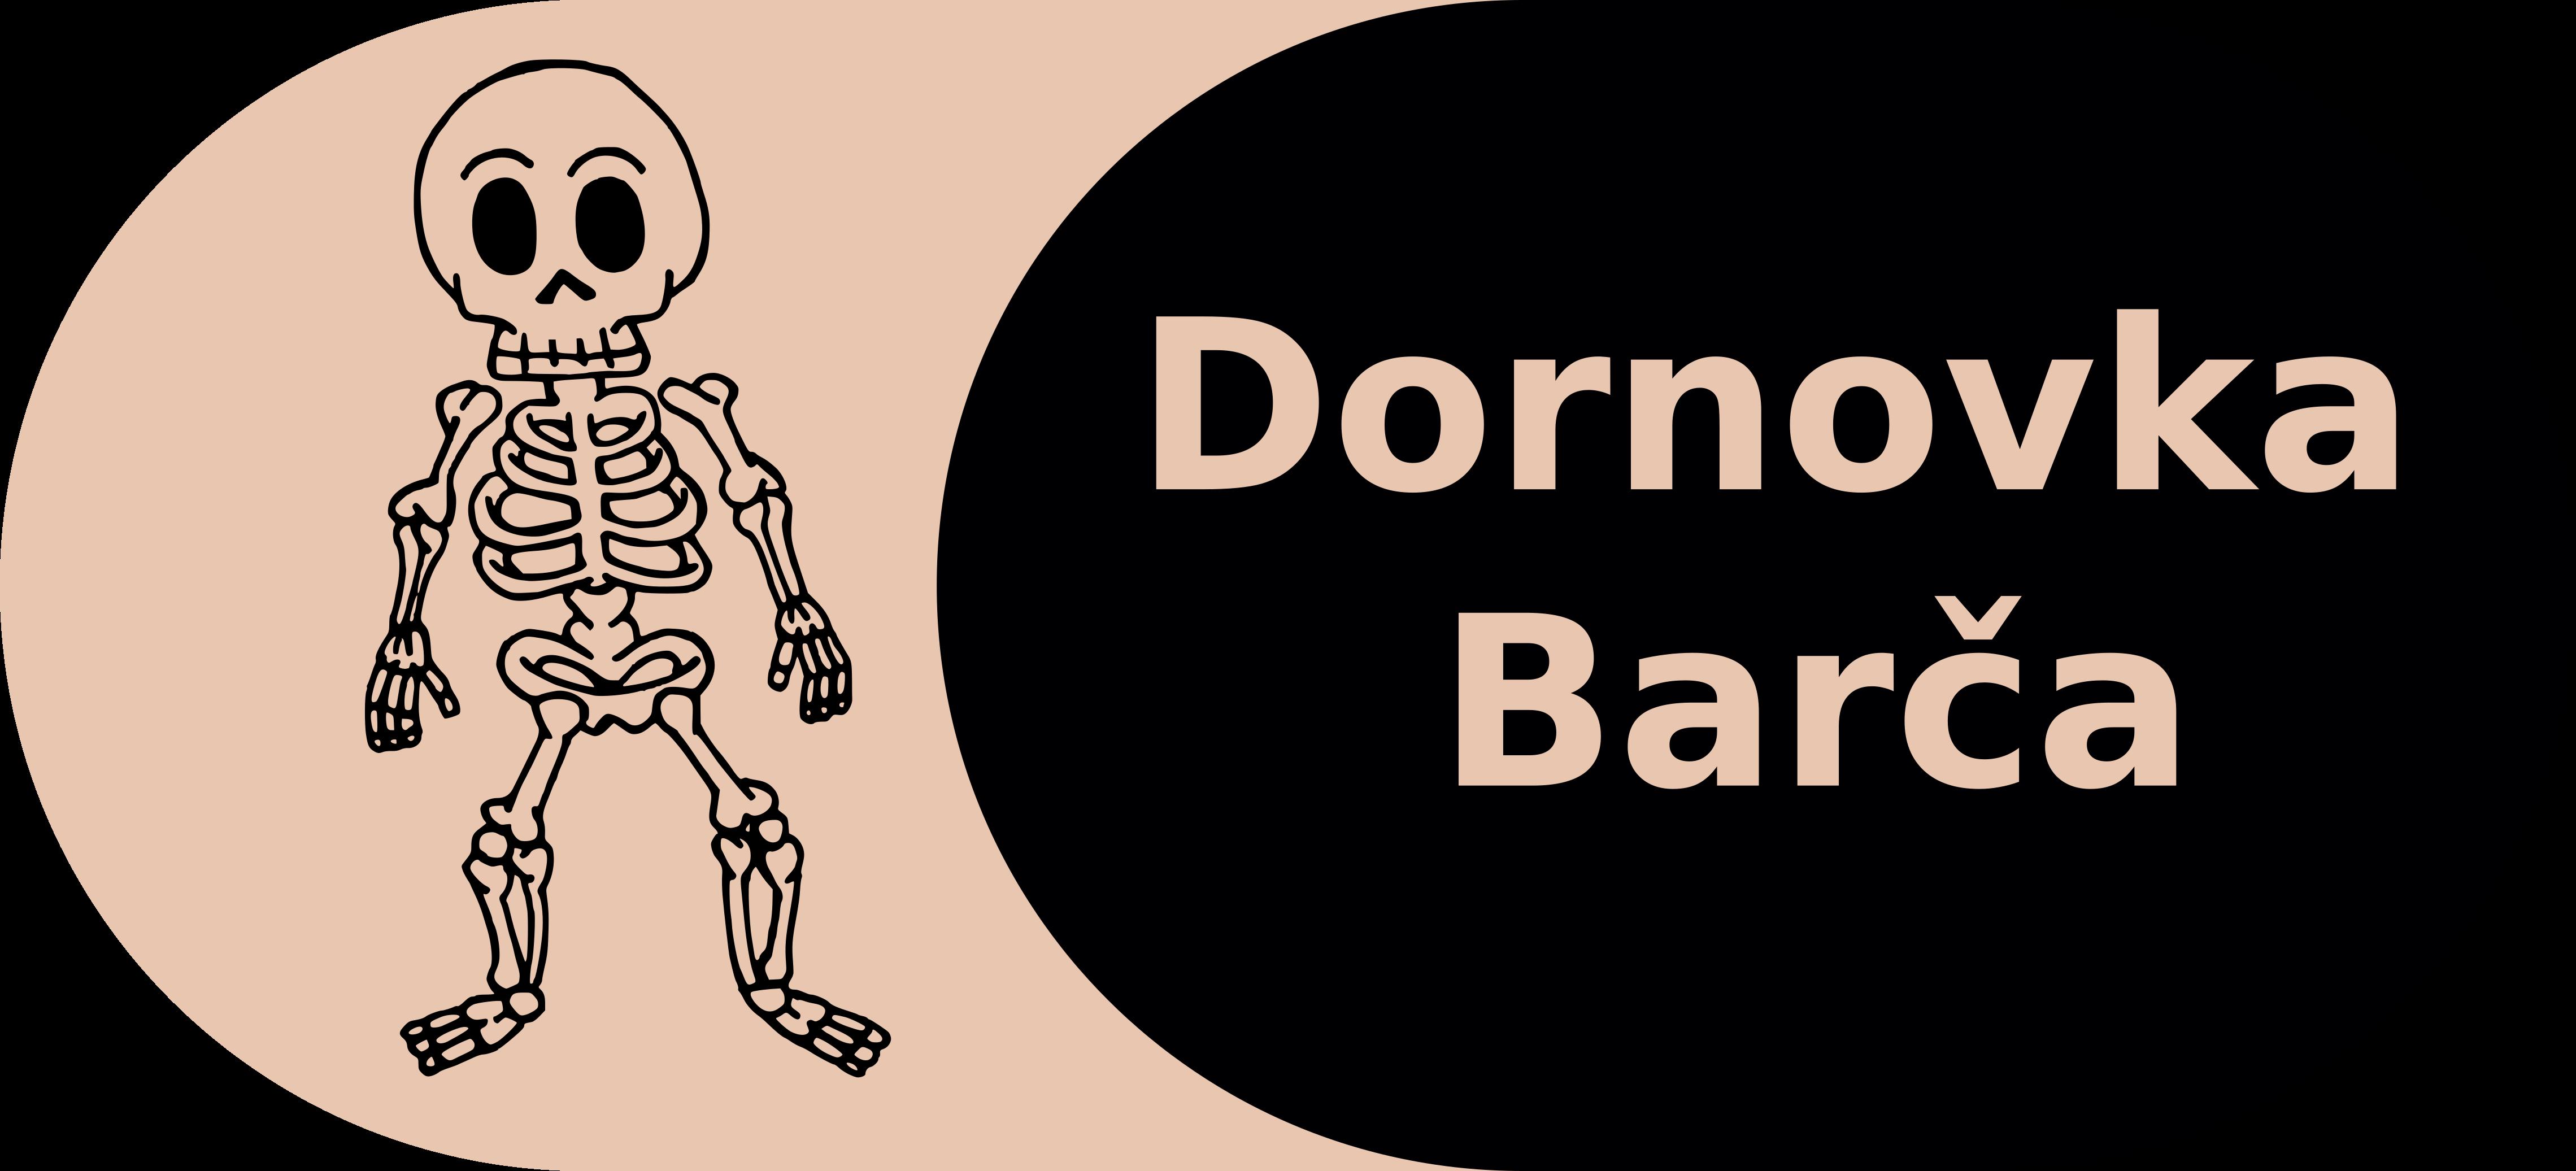 Dornovka Barča